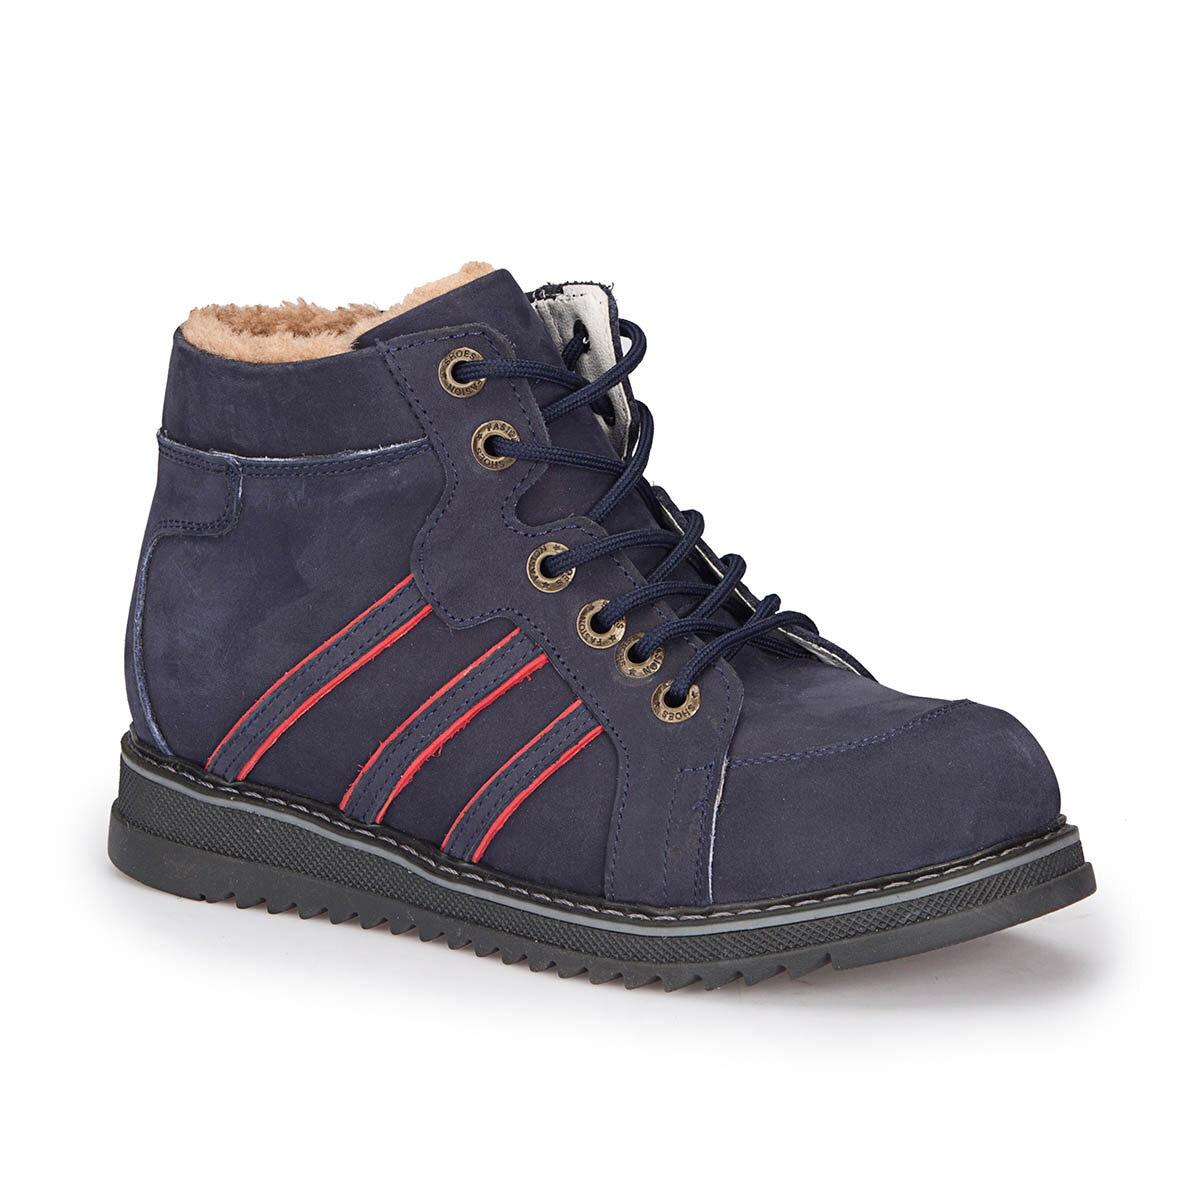 FLO 72.509761.F Navy Blue Male Child Sneaker Shoes Polaris Boots     - title=